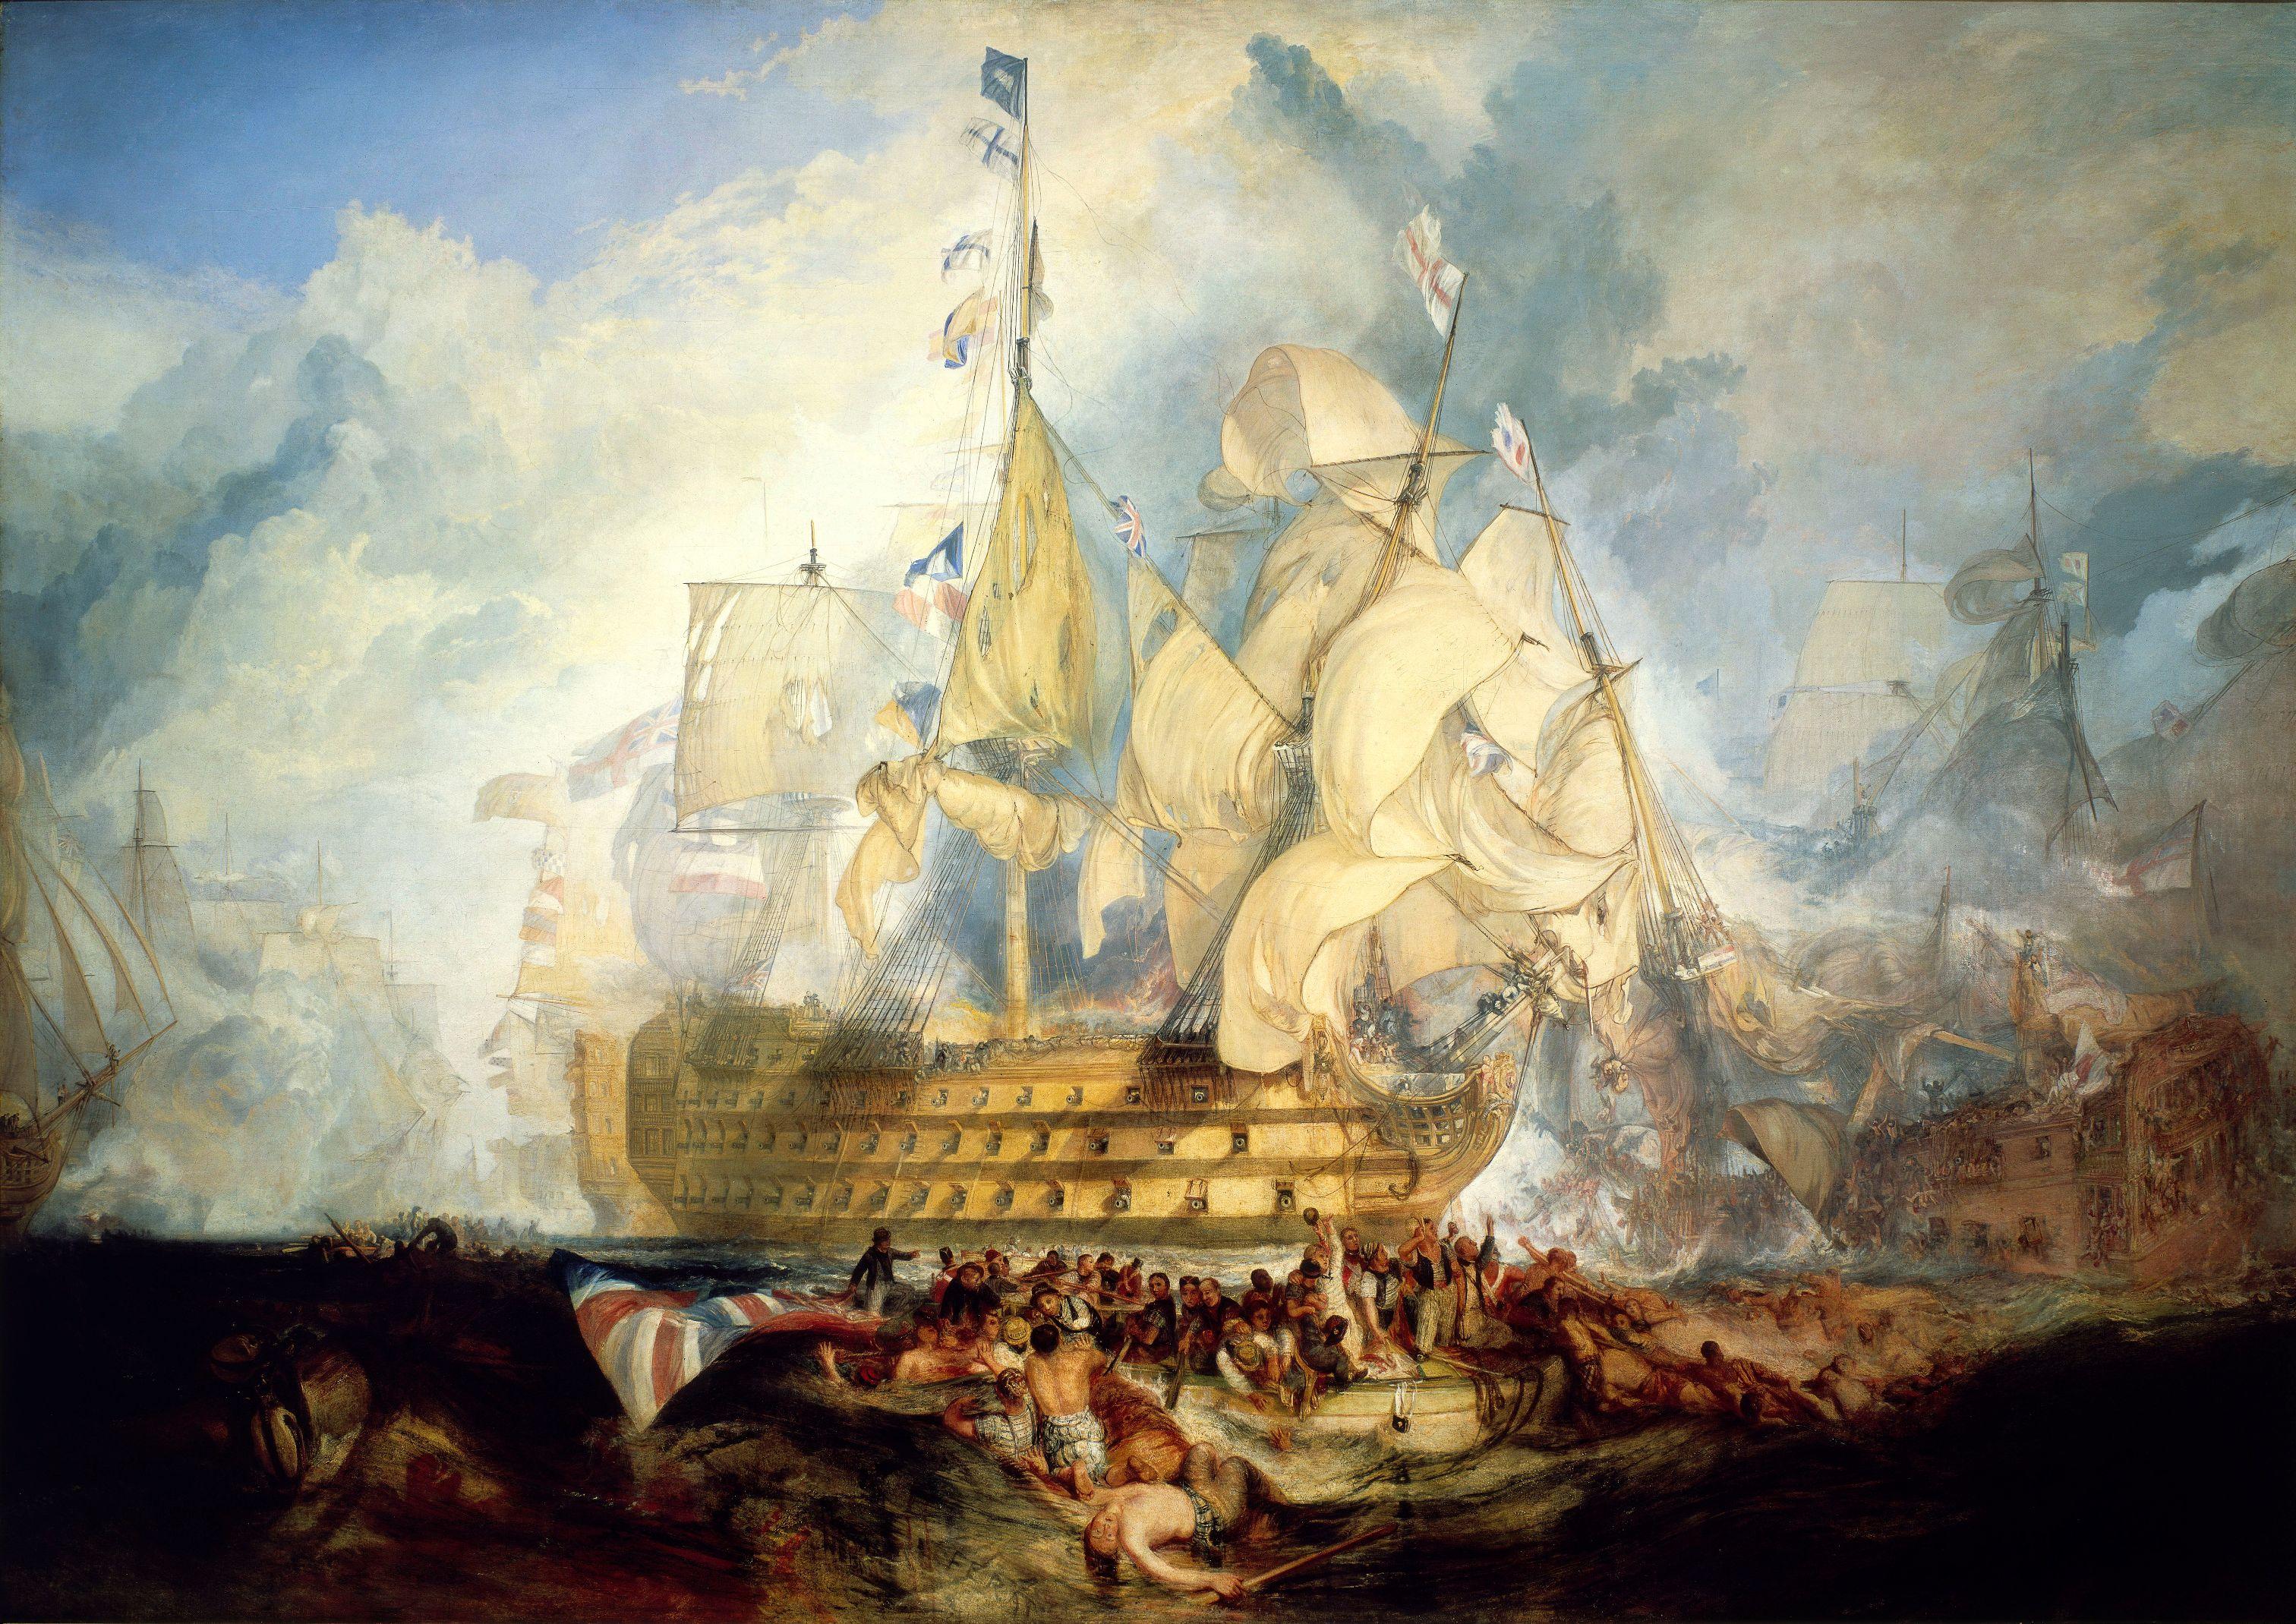 joseph-mallord-william-turner-the-battle-of-trafalgar-1824-trivium-art-history-2